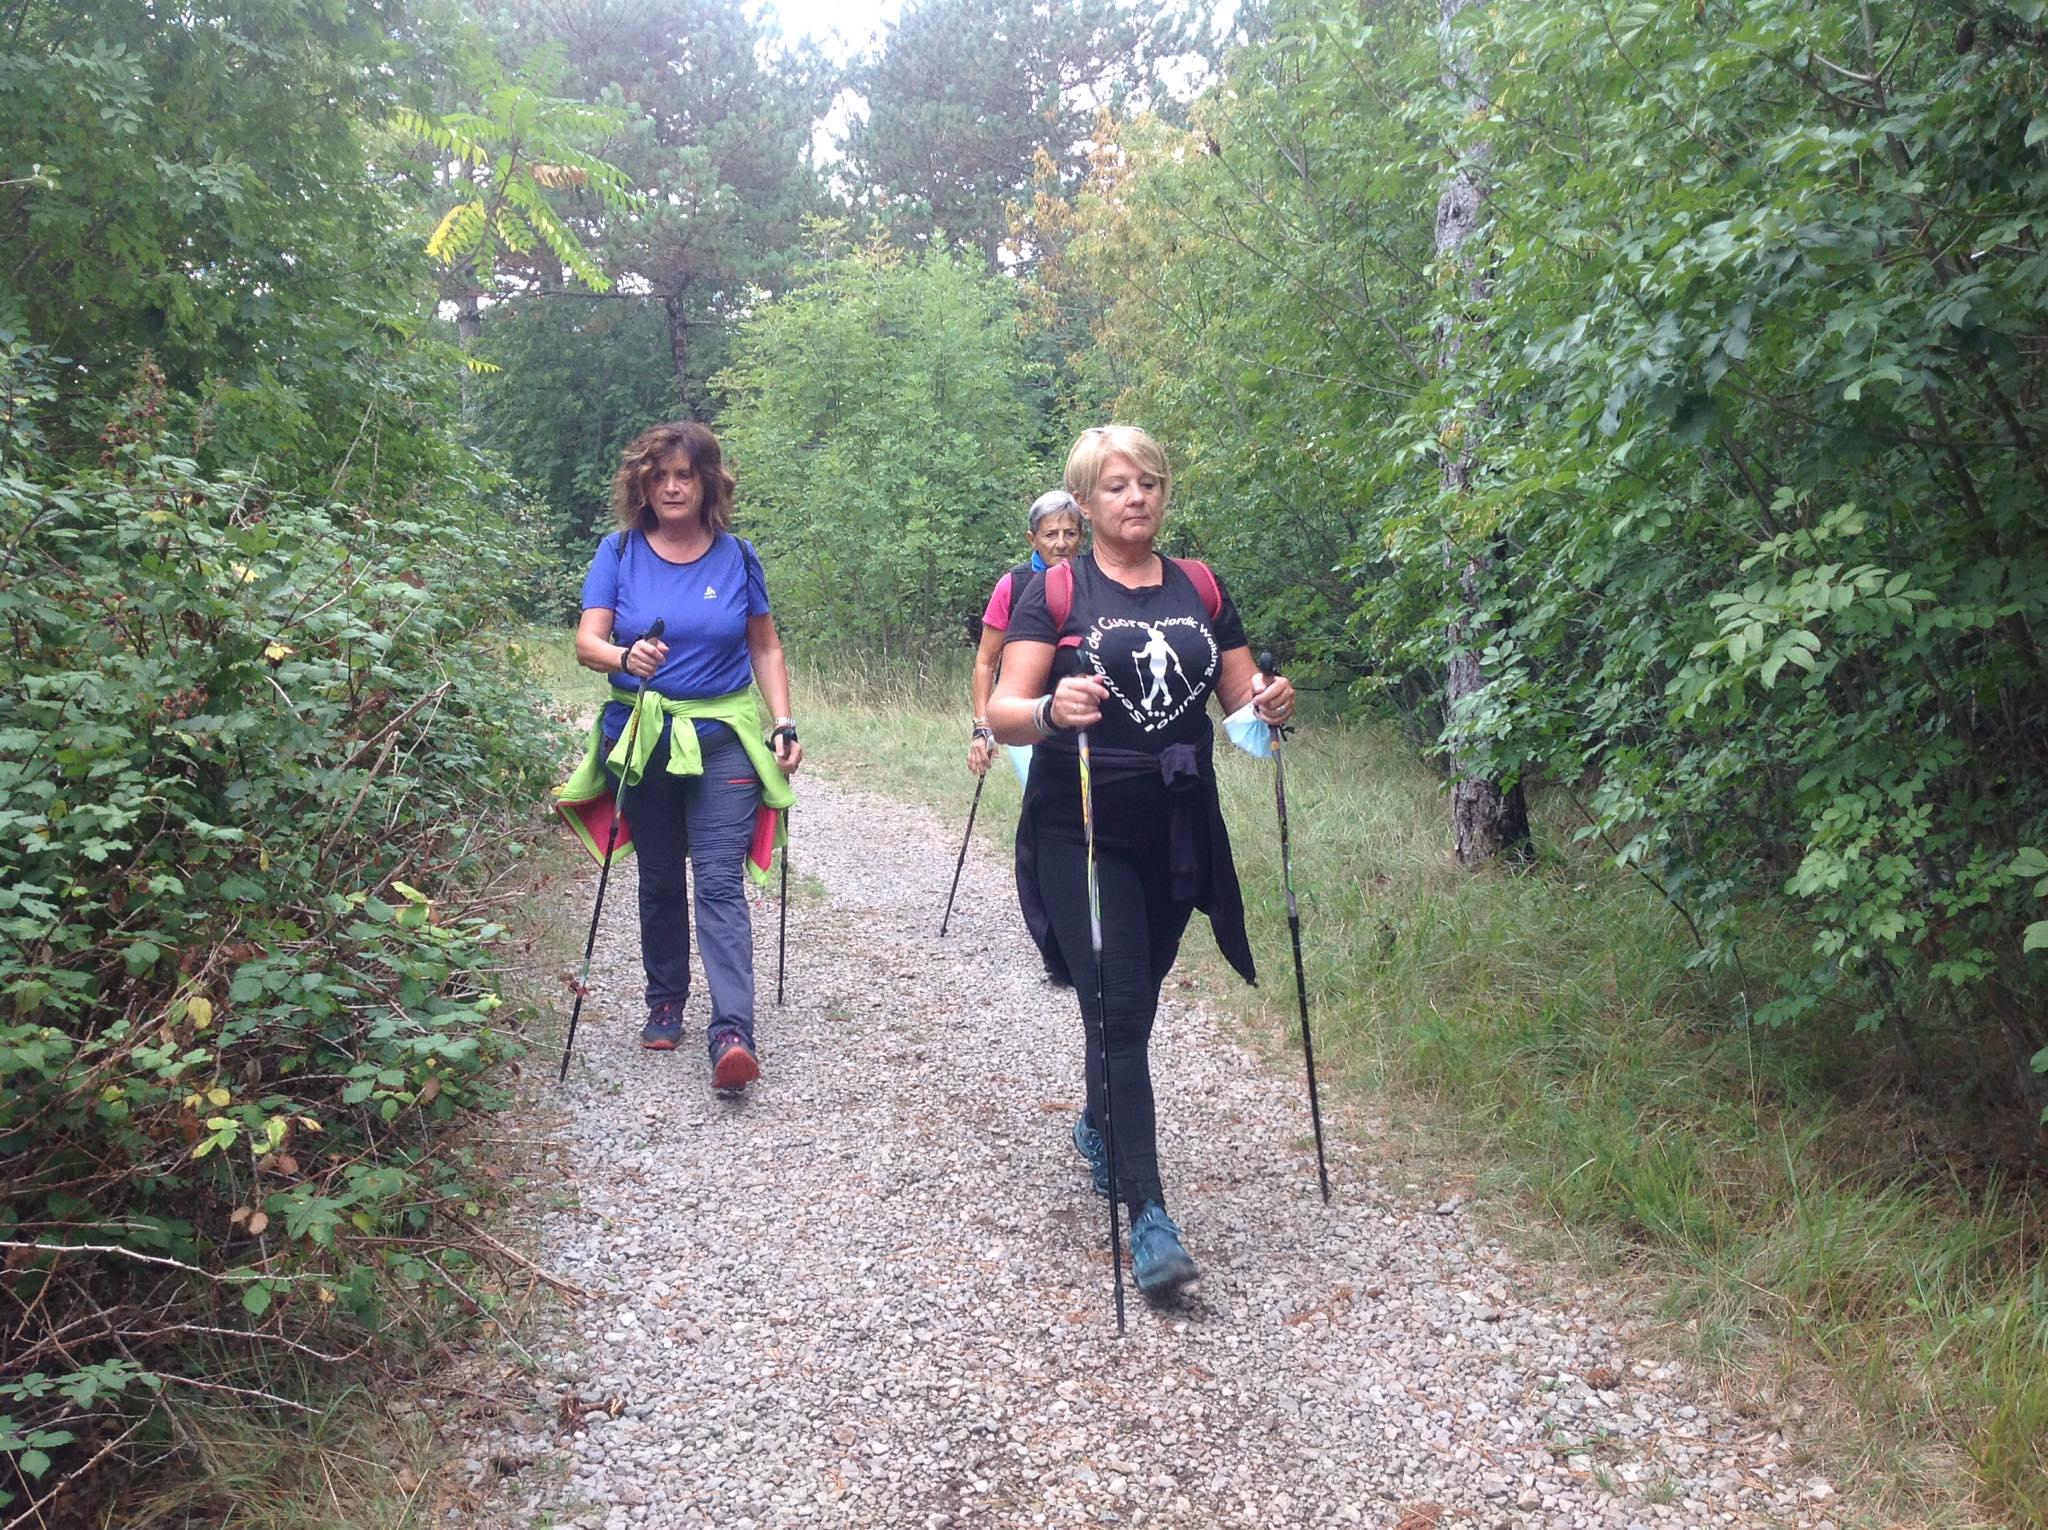 2020-09-23 Nordic Walking - Trebiciano - Gropada (S) (1)